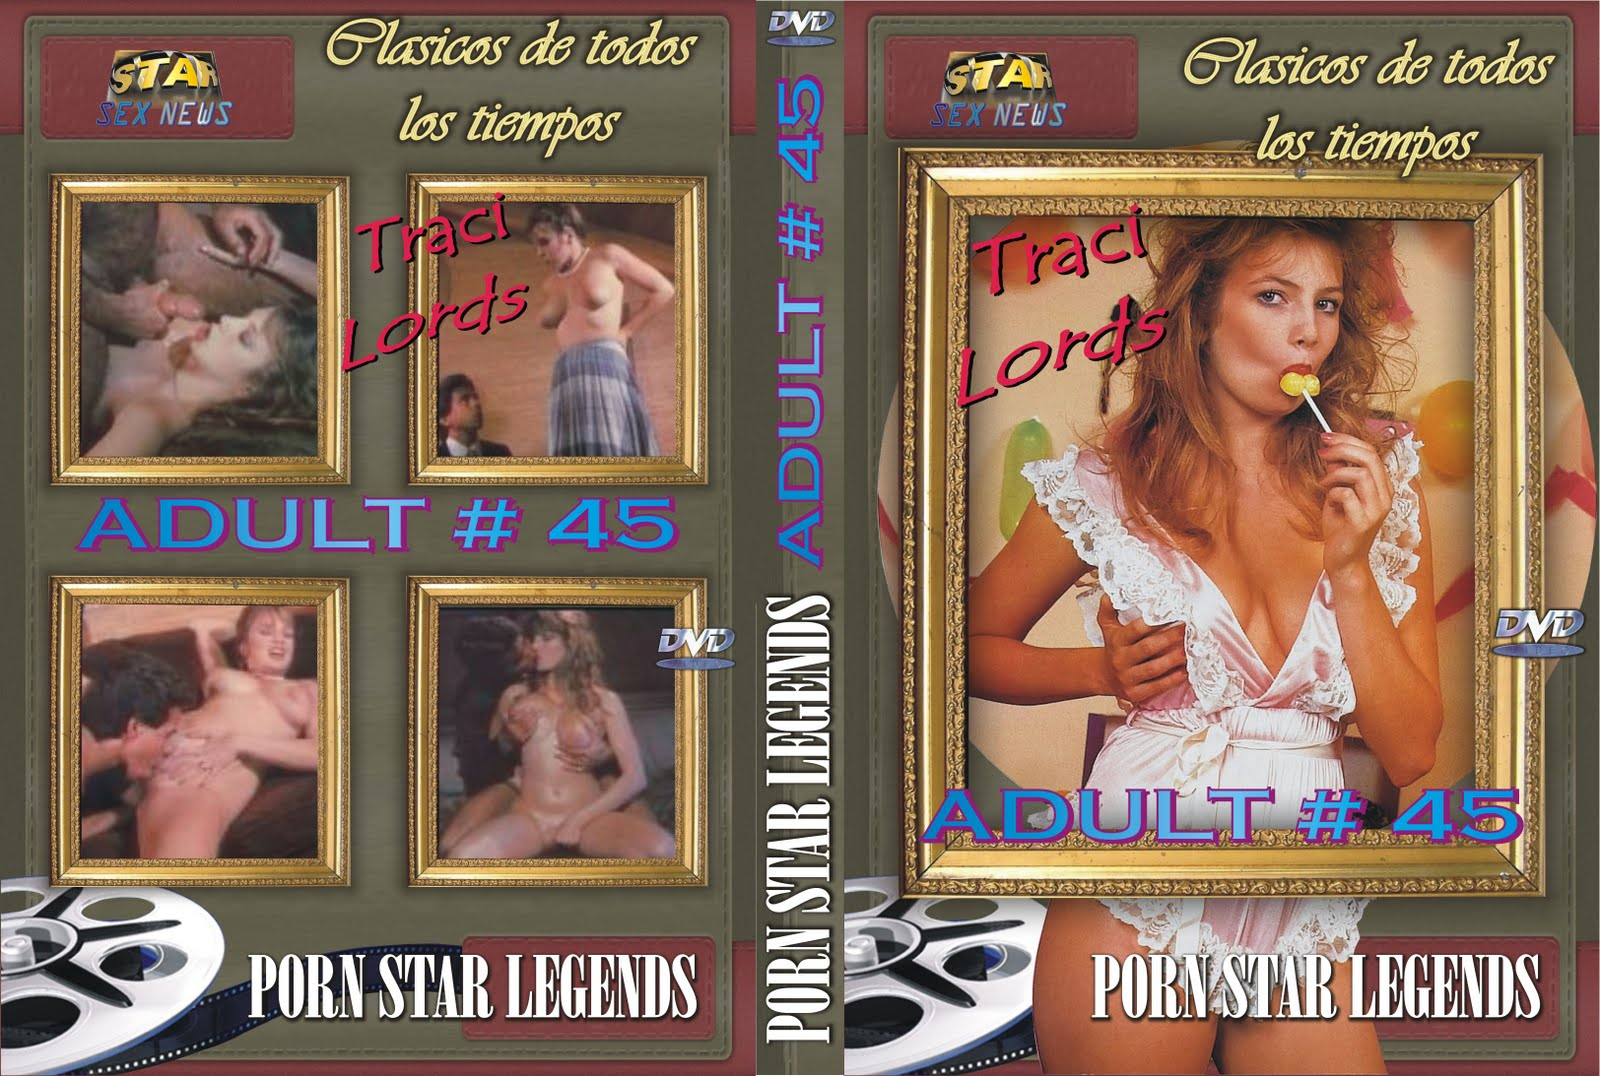 Mire DVD gratis para adultos